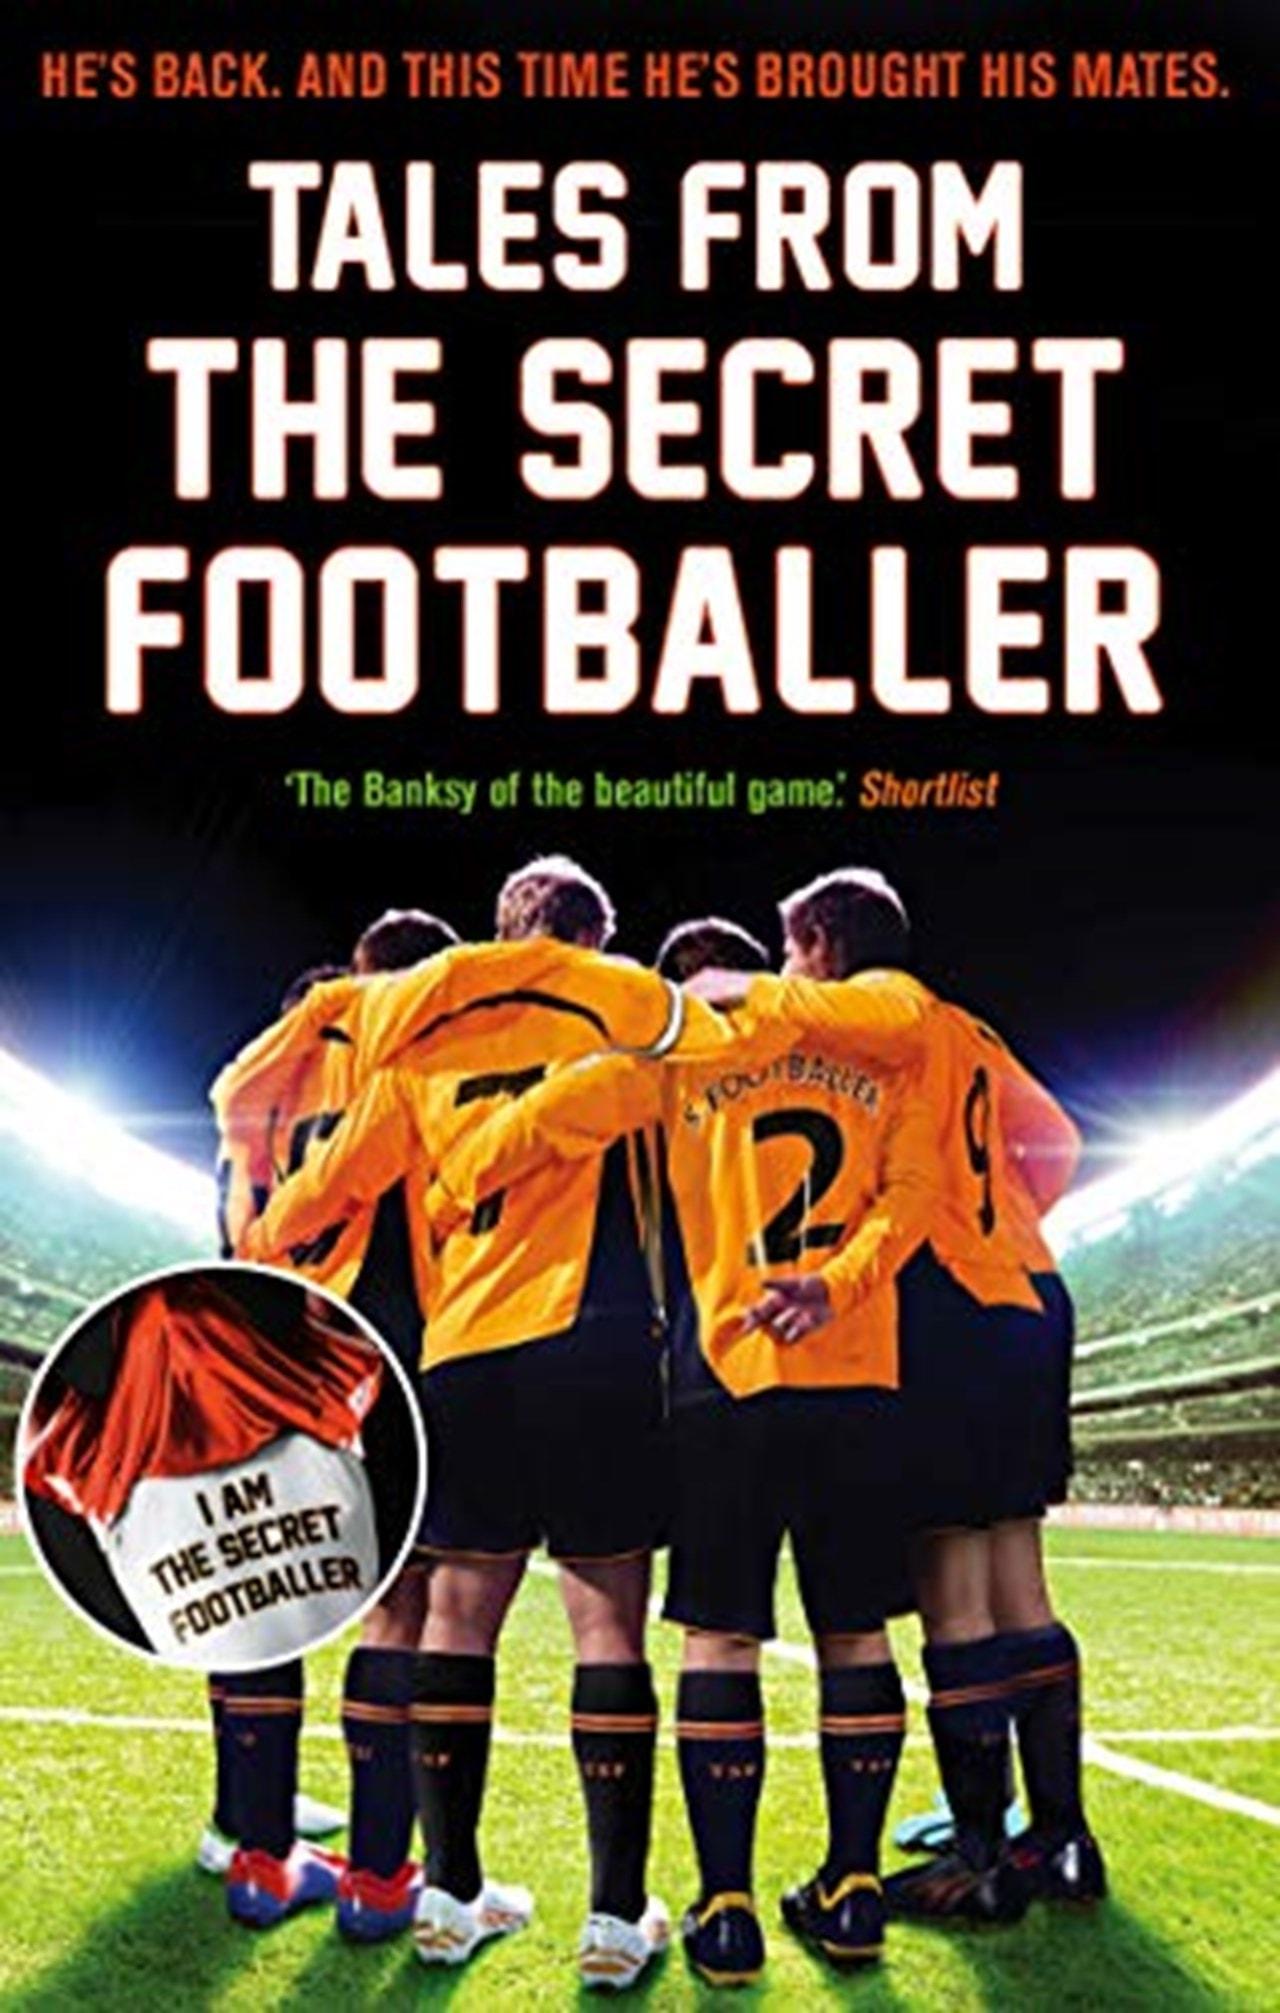 Tales From The Secret Footballer - 1